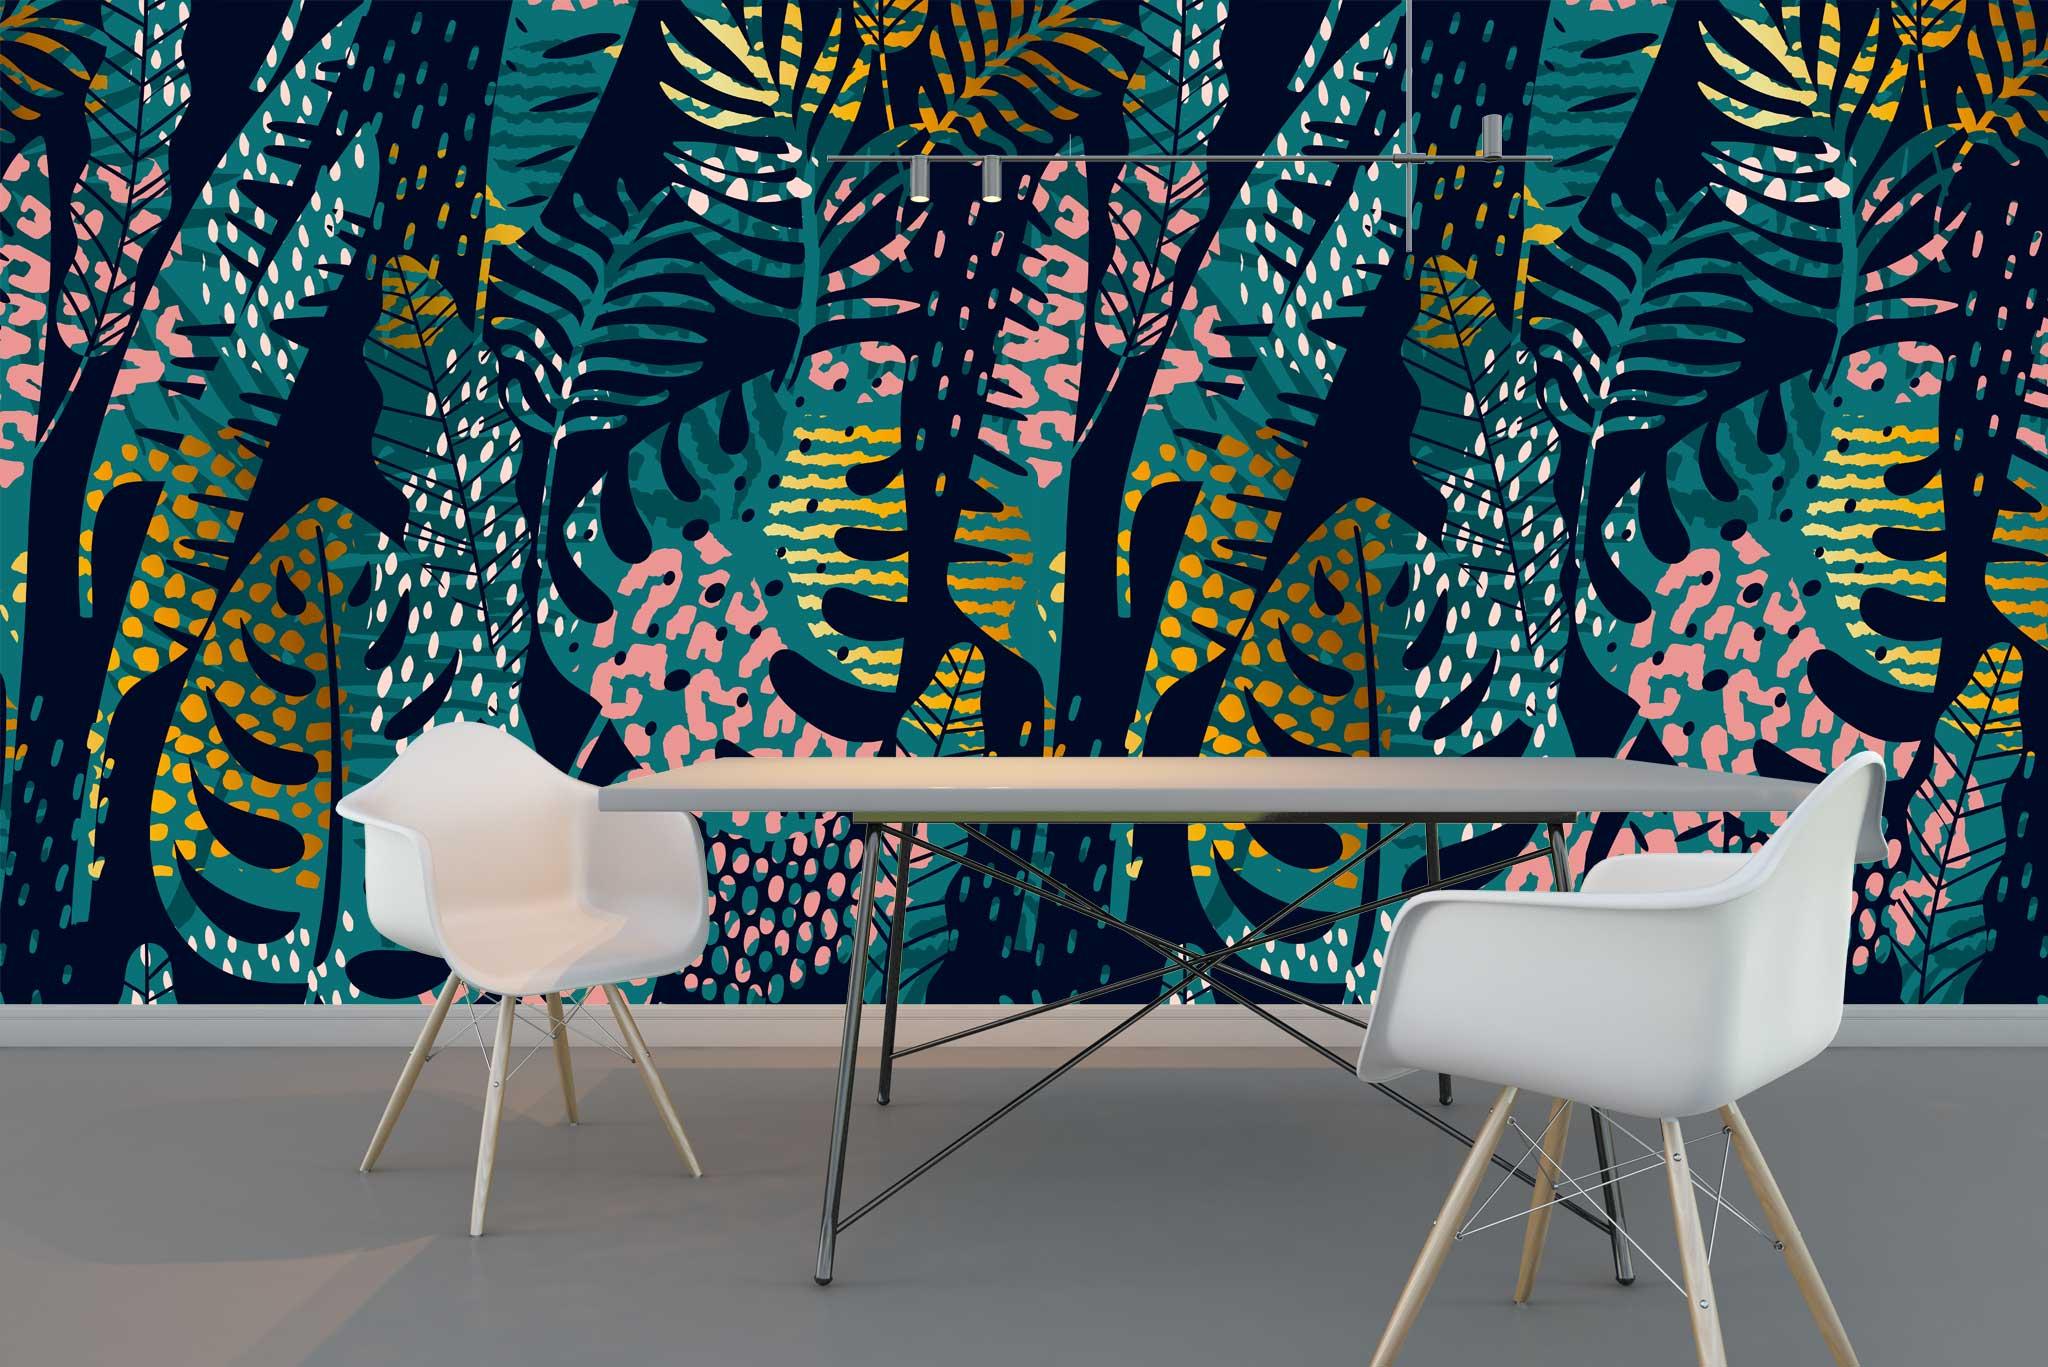 tapet-fototapet-comanda-personalizat-bucuresti-perete-special-lux-model-vegetal-frunze-flori-exotice-tropical-negru